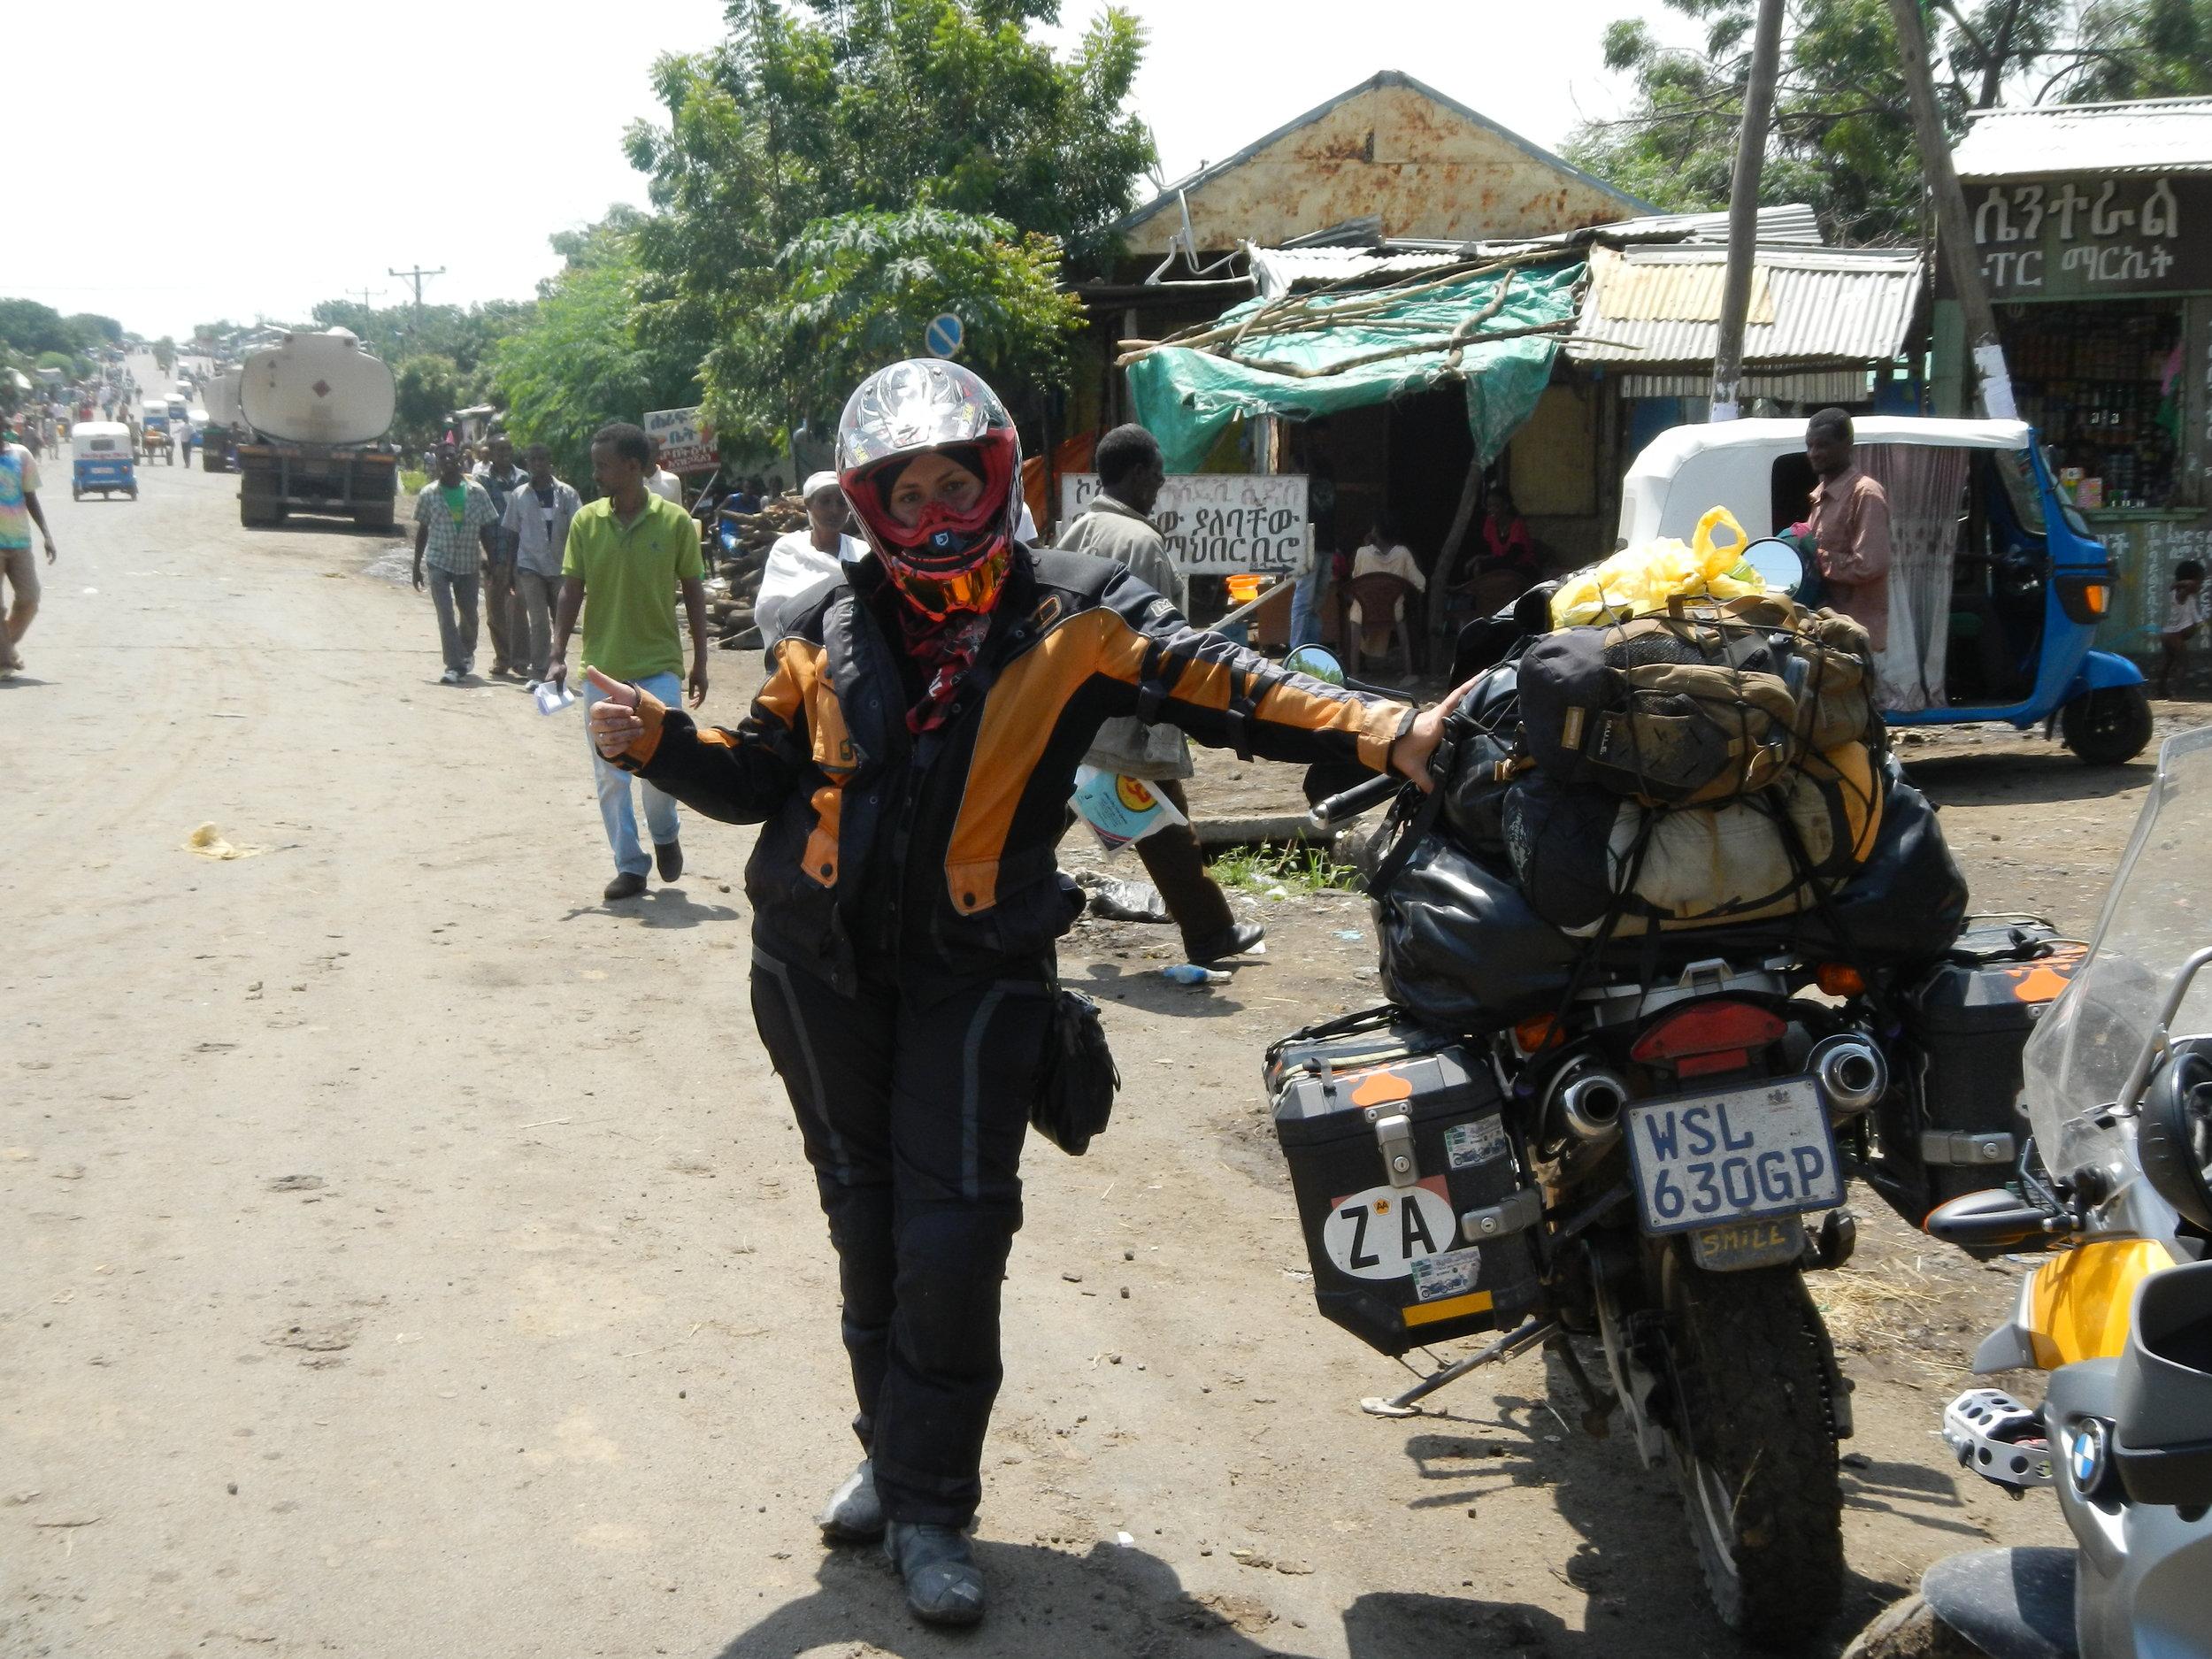 Jo-Rust-Adventure-Rider-Radio-Motorcycle-Podcast-9.JPG